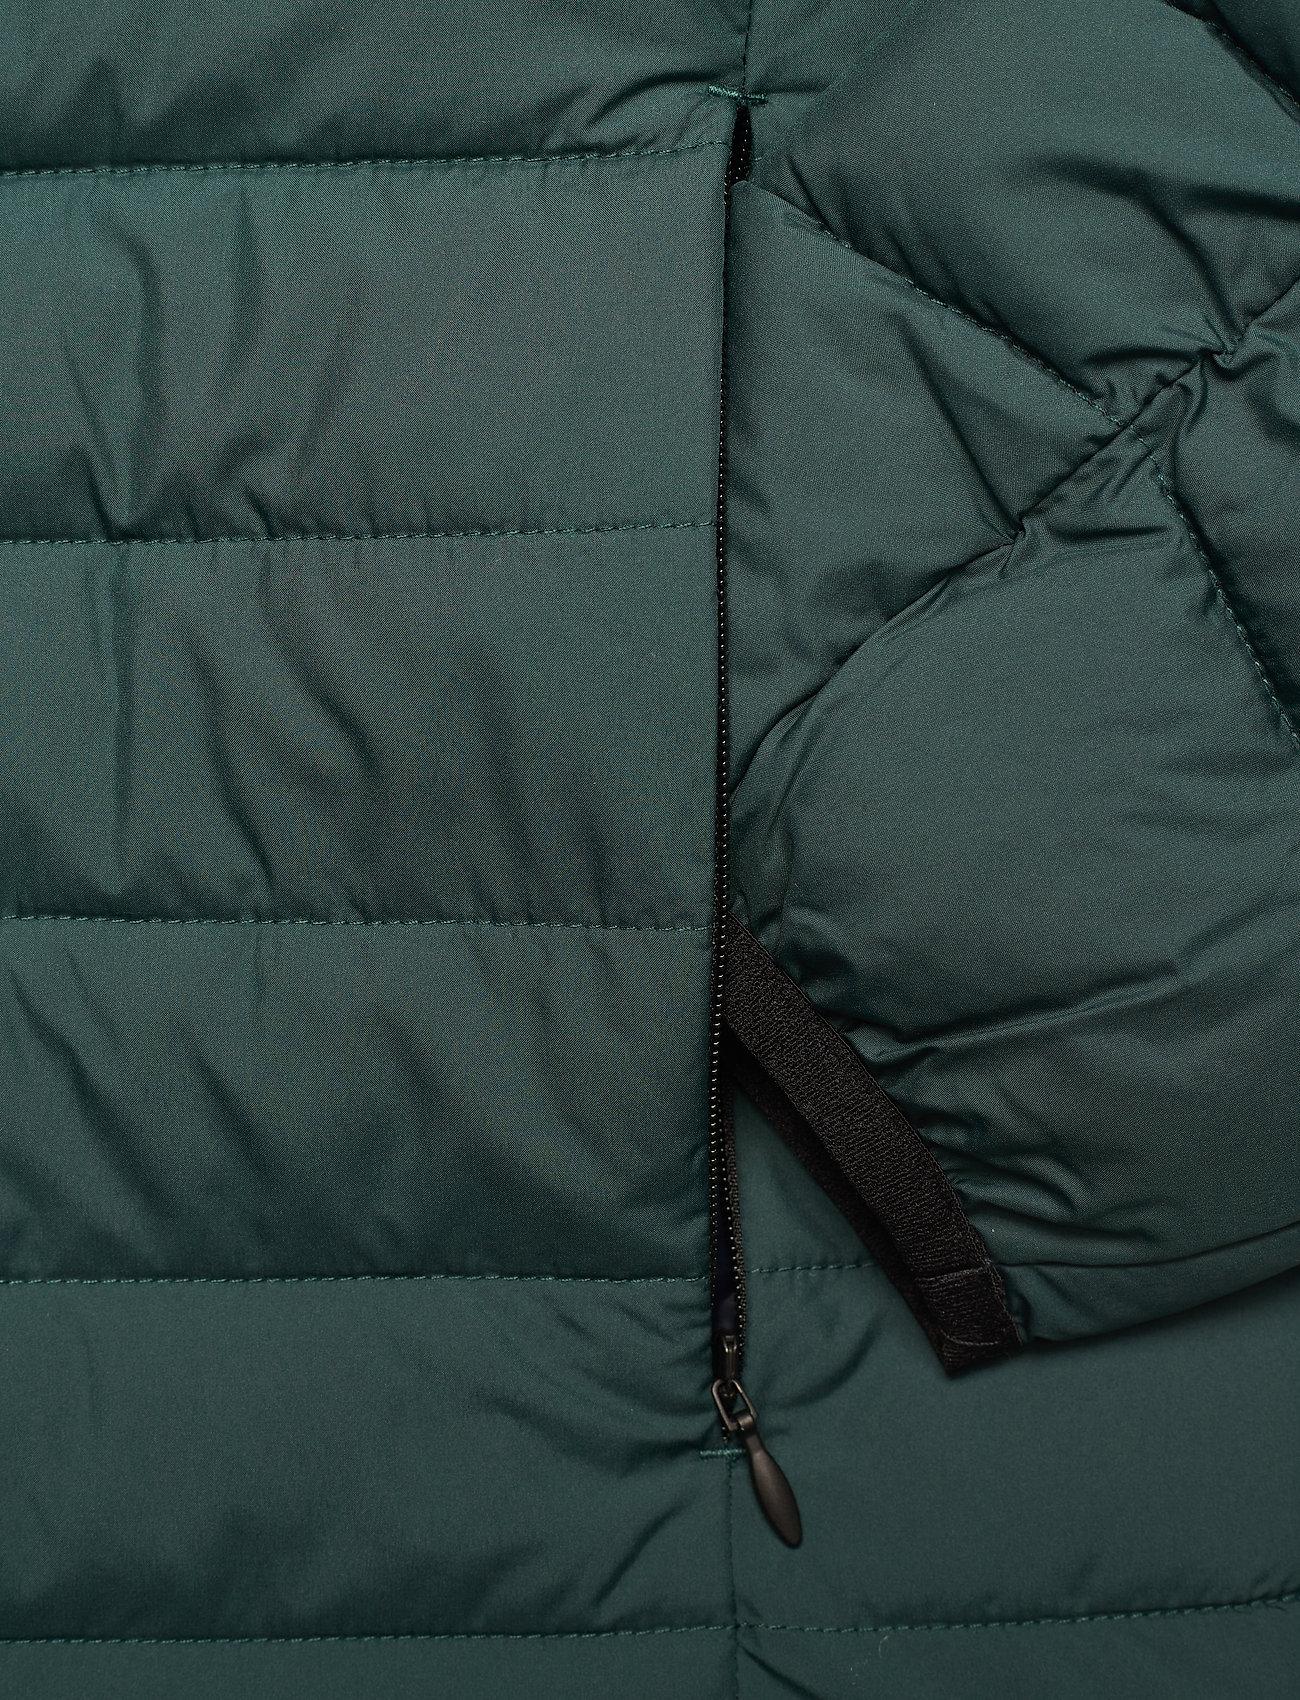 ECOALF - BERET JACKET MAN - kurtki puchowe - dark green - 5